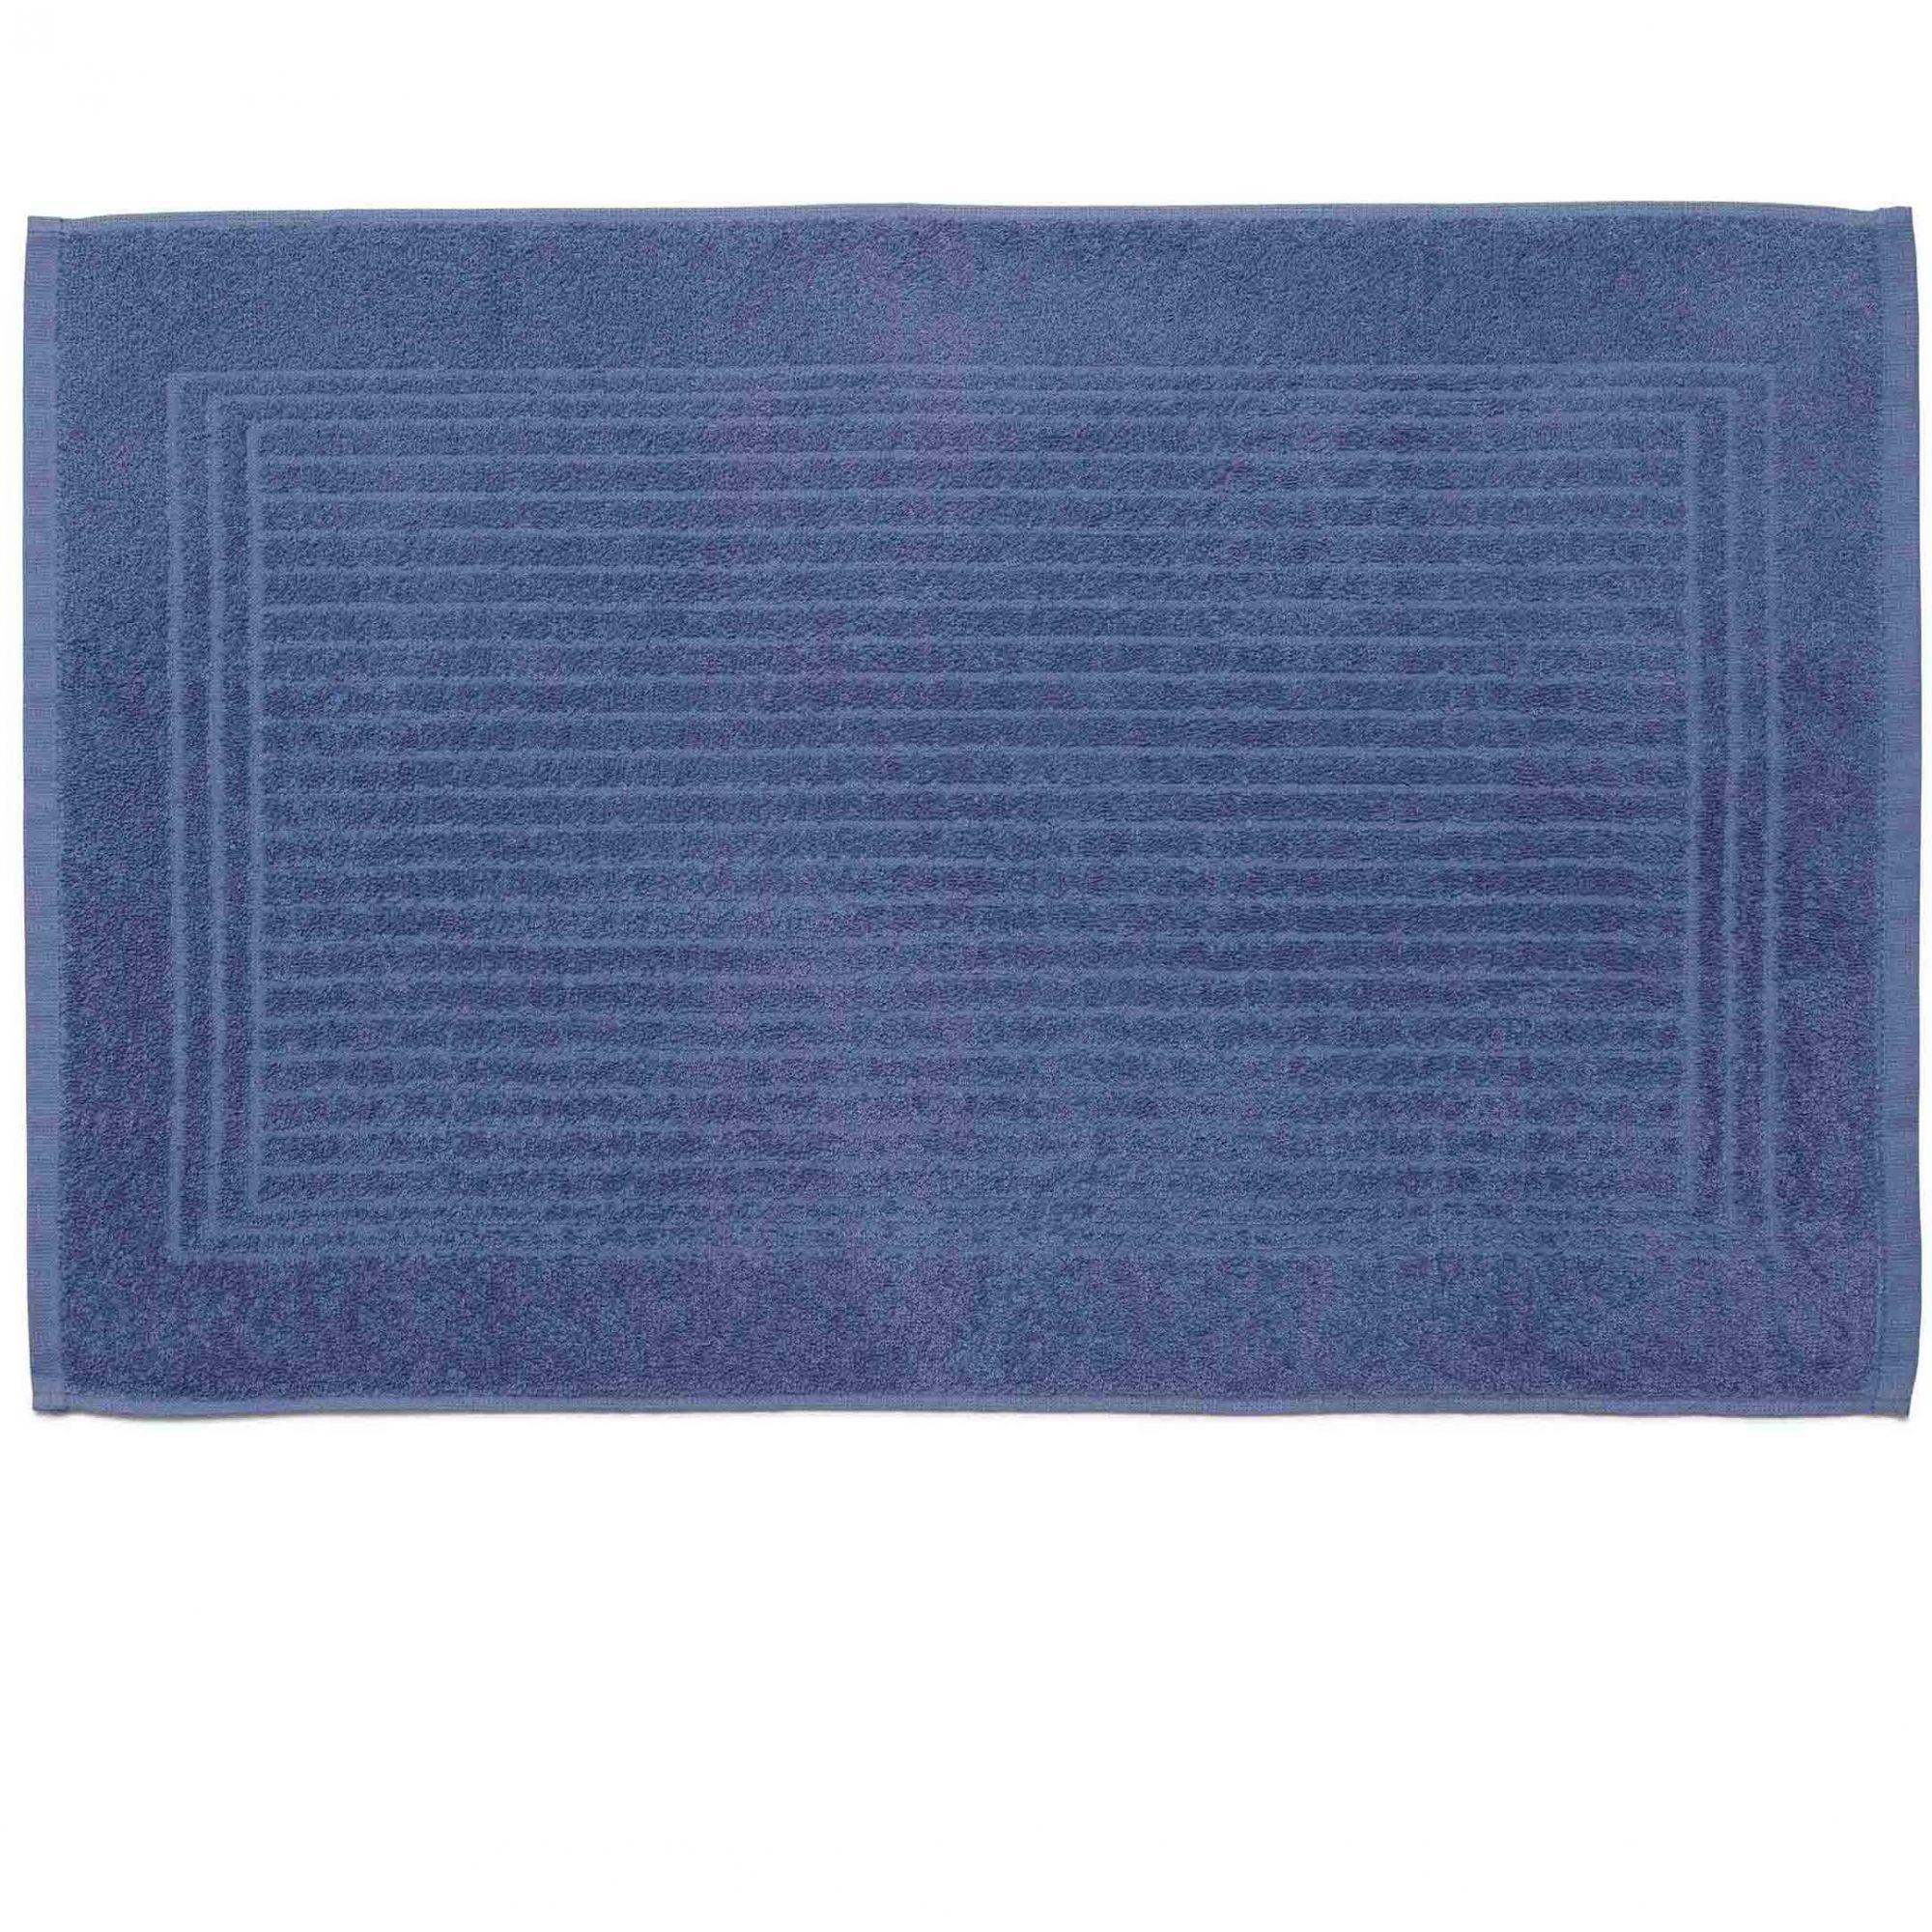 Piso cedro santista azul royal 100% algodao